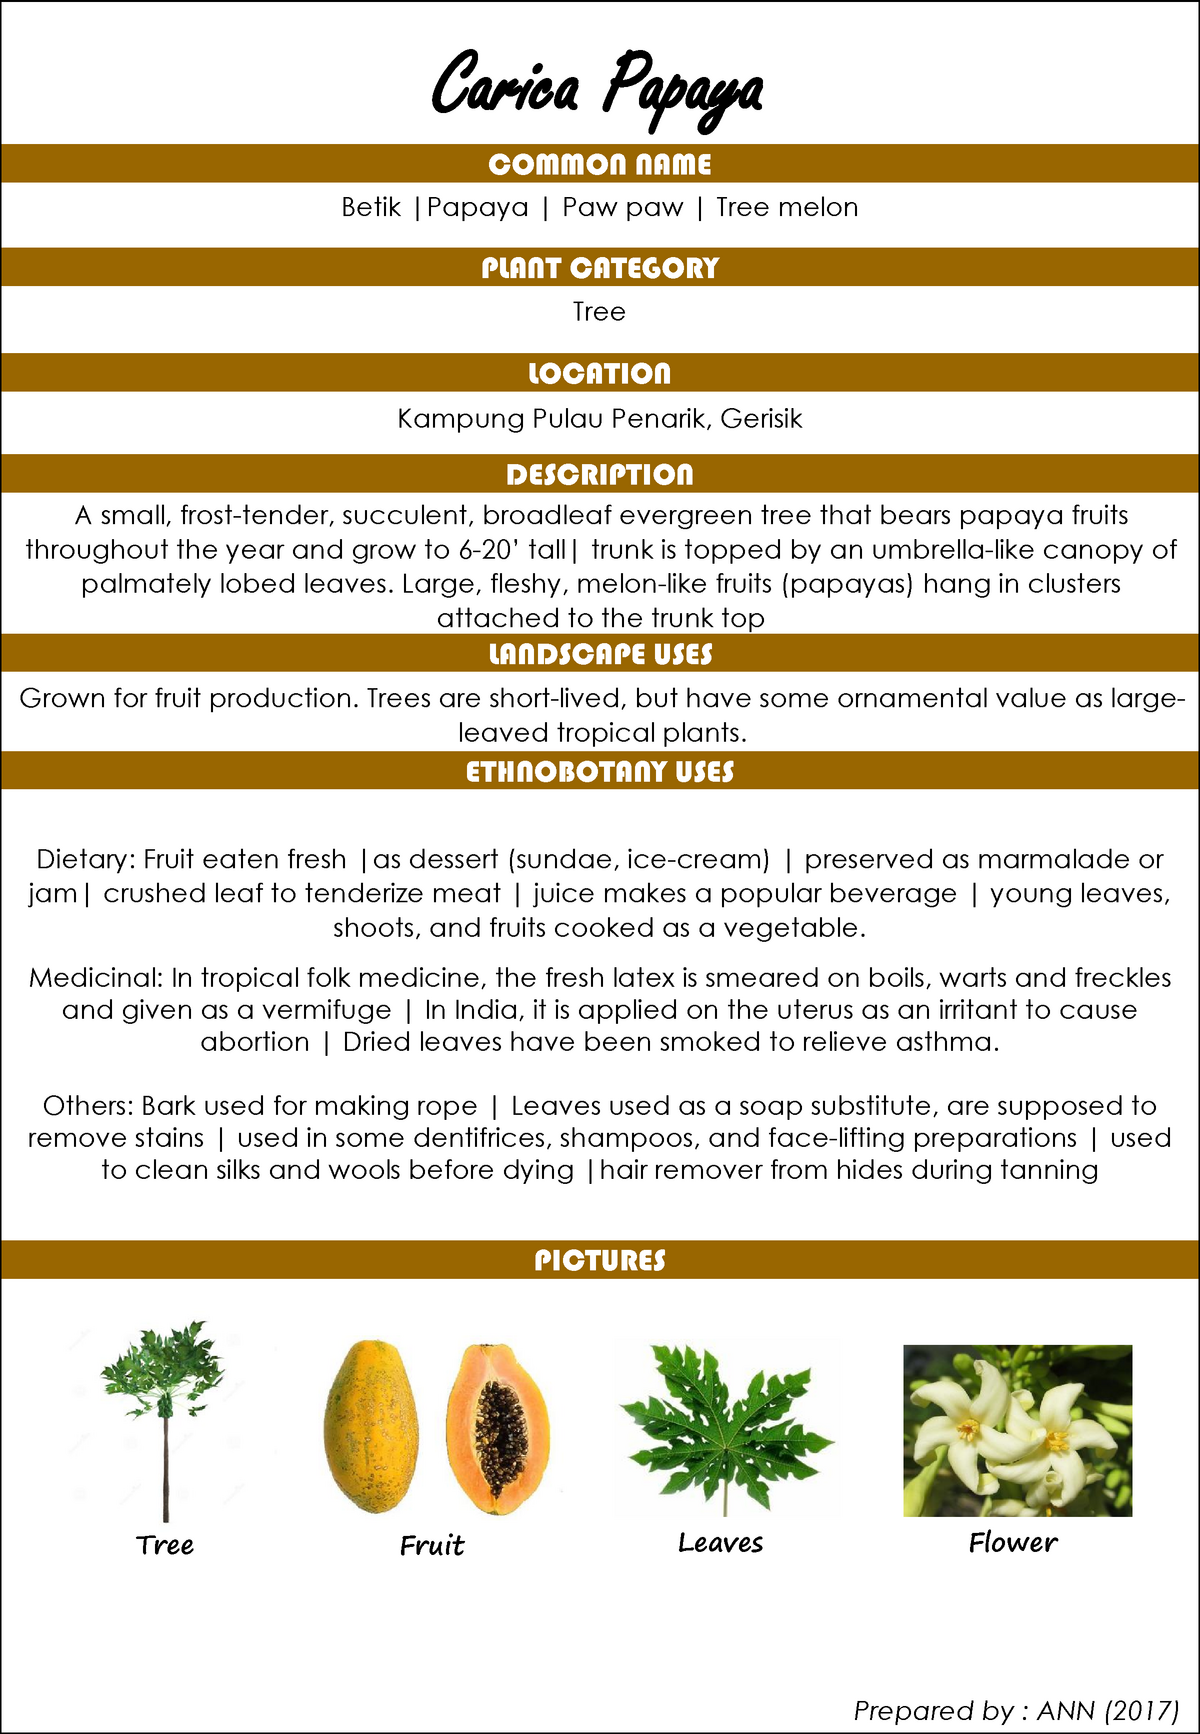 Herbarium Assignment (Tangkak District) - SBEL1532